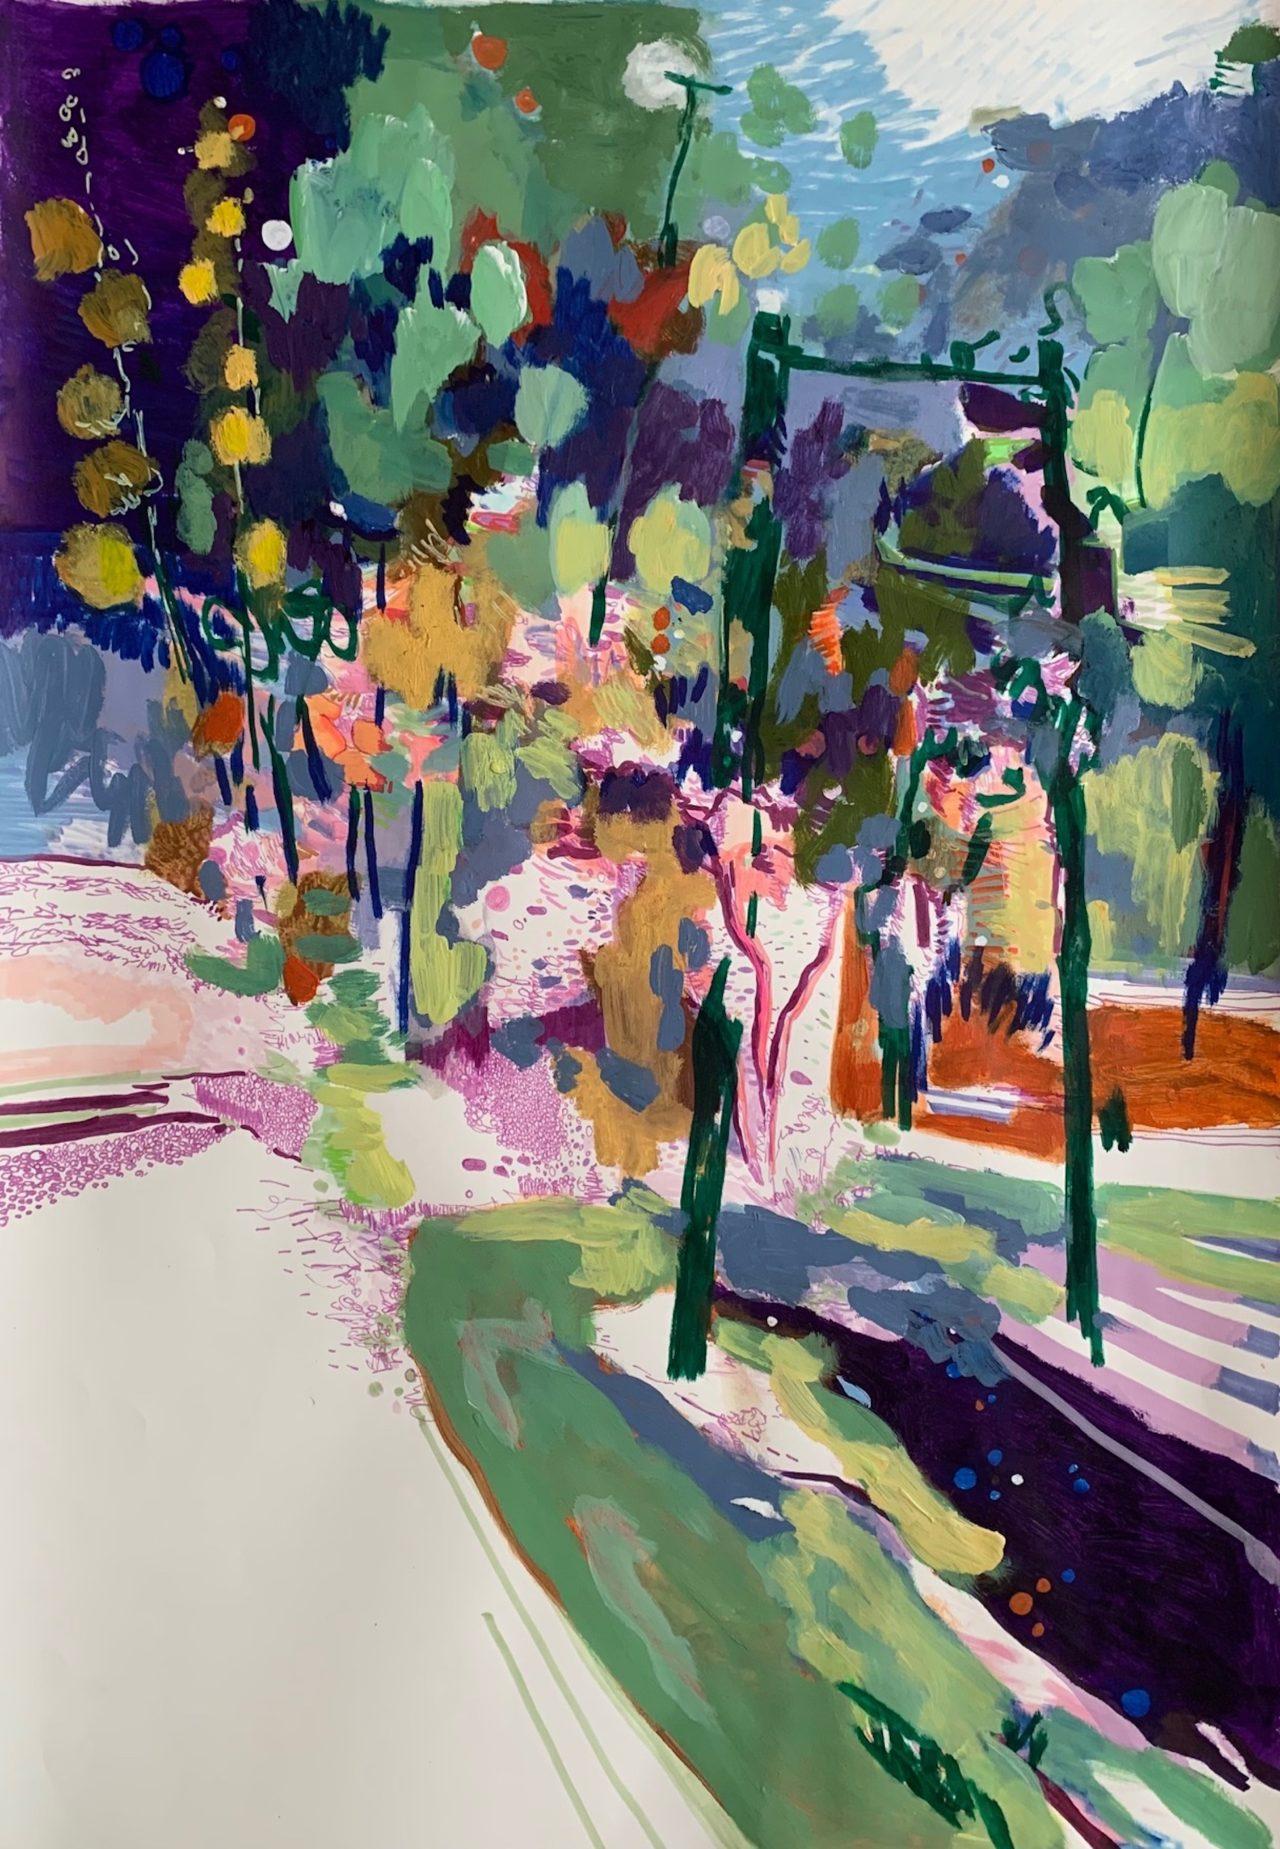 Panta rhei, 100 x 70 cm, Acryl, Lackstifte und Stifte auf Papier, 2021